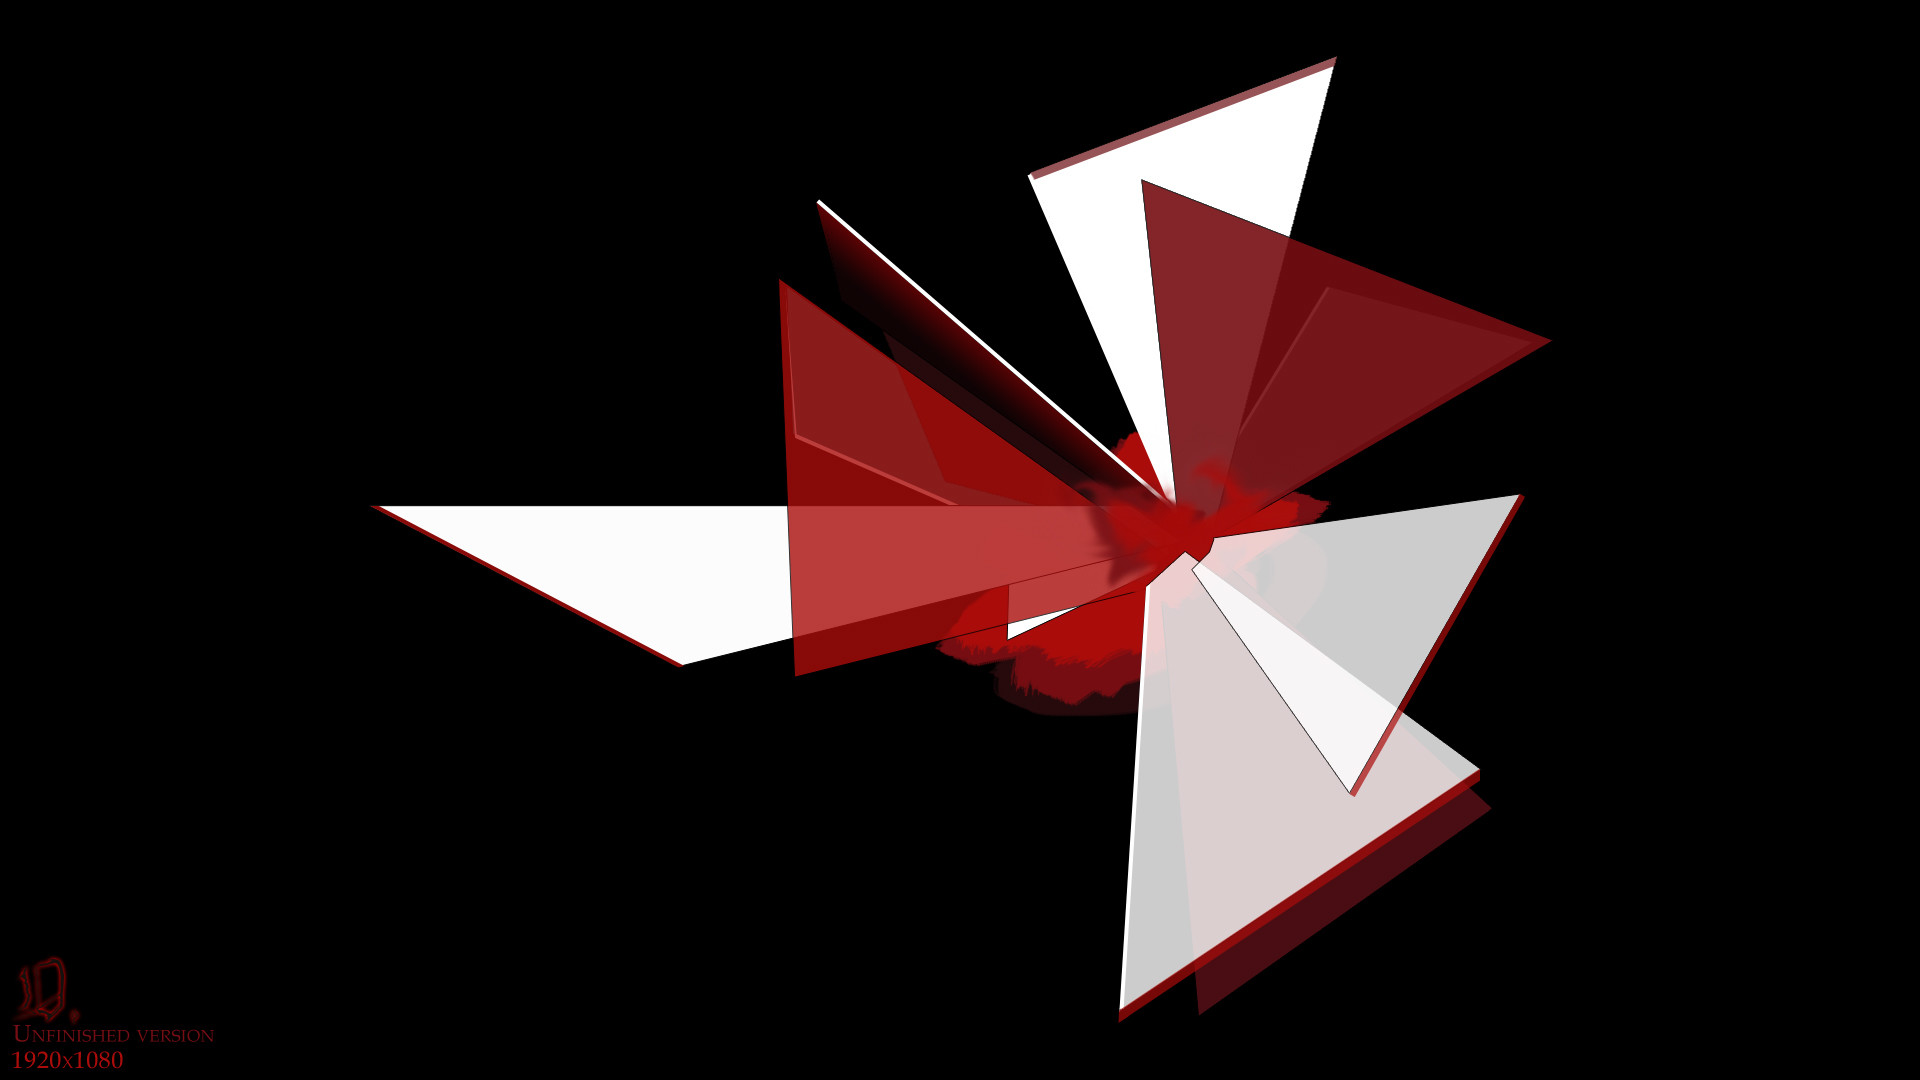 Resident Evil Umbrella logo – Shattered by Daunlouded on DeviantArt